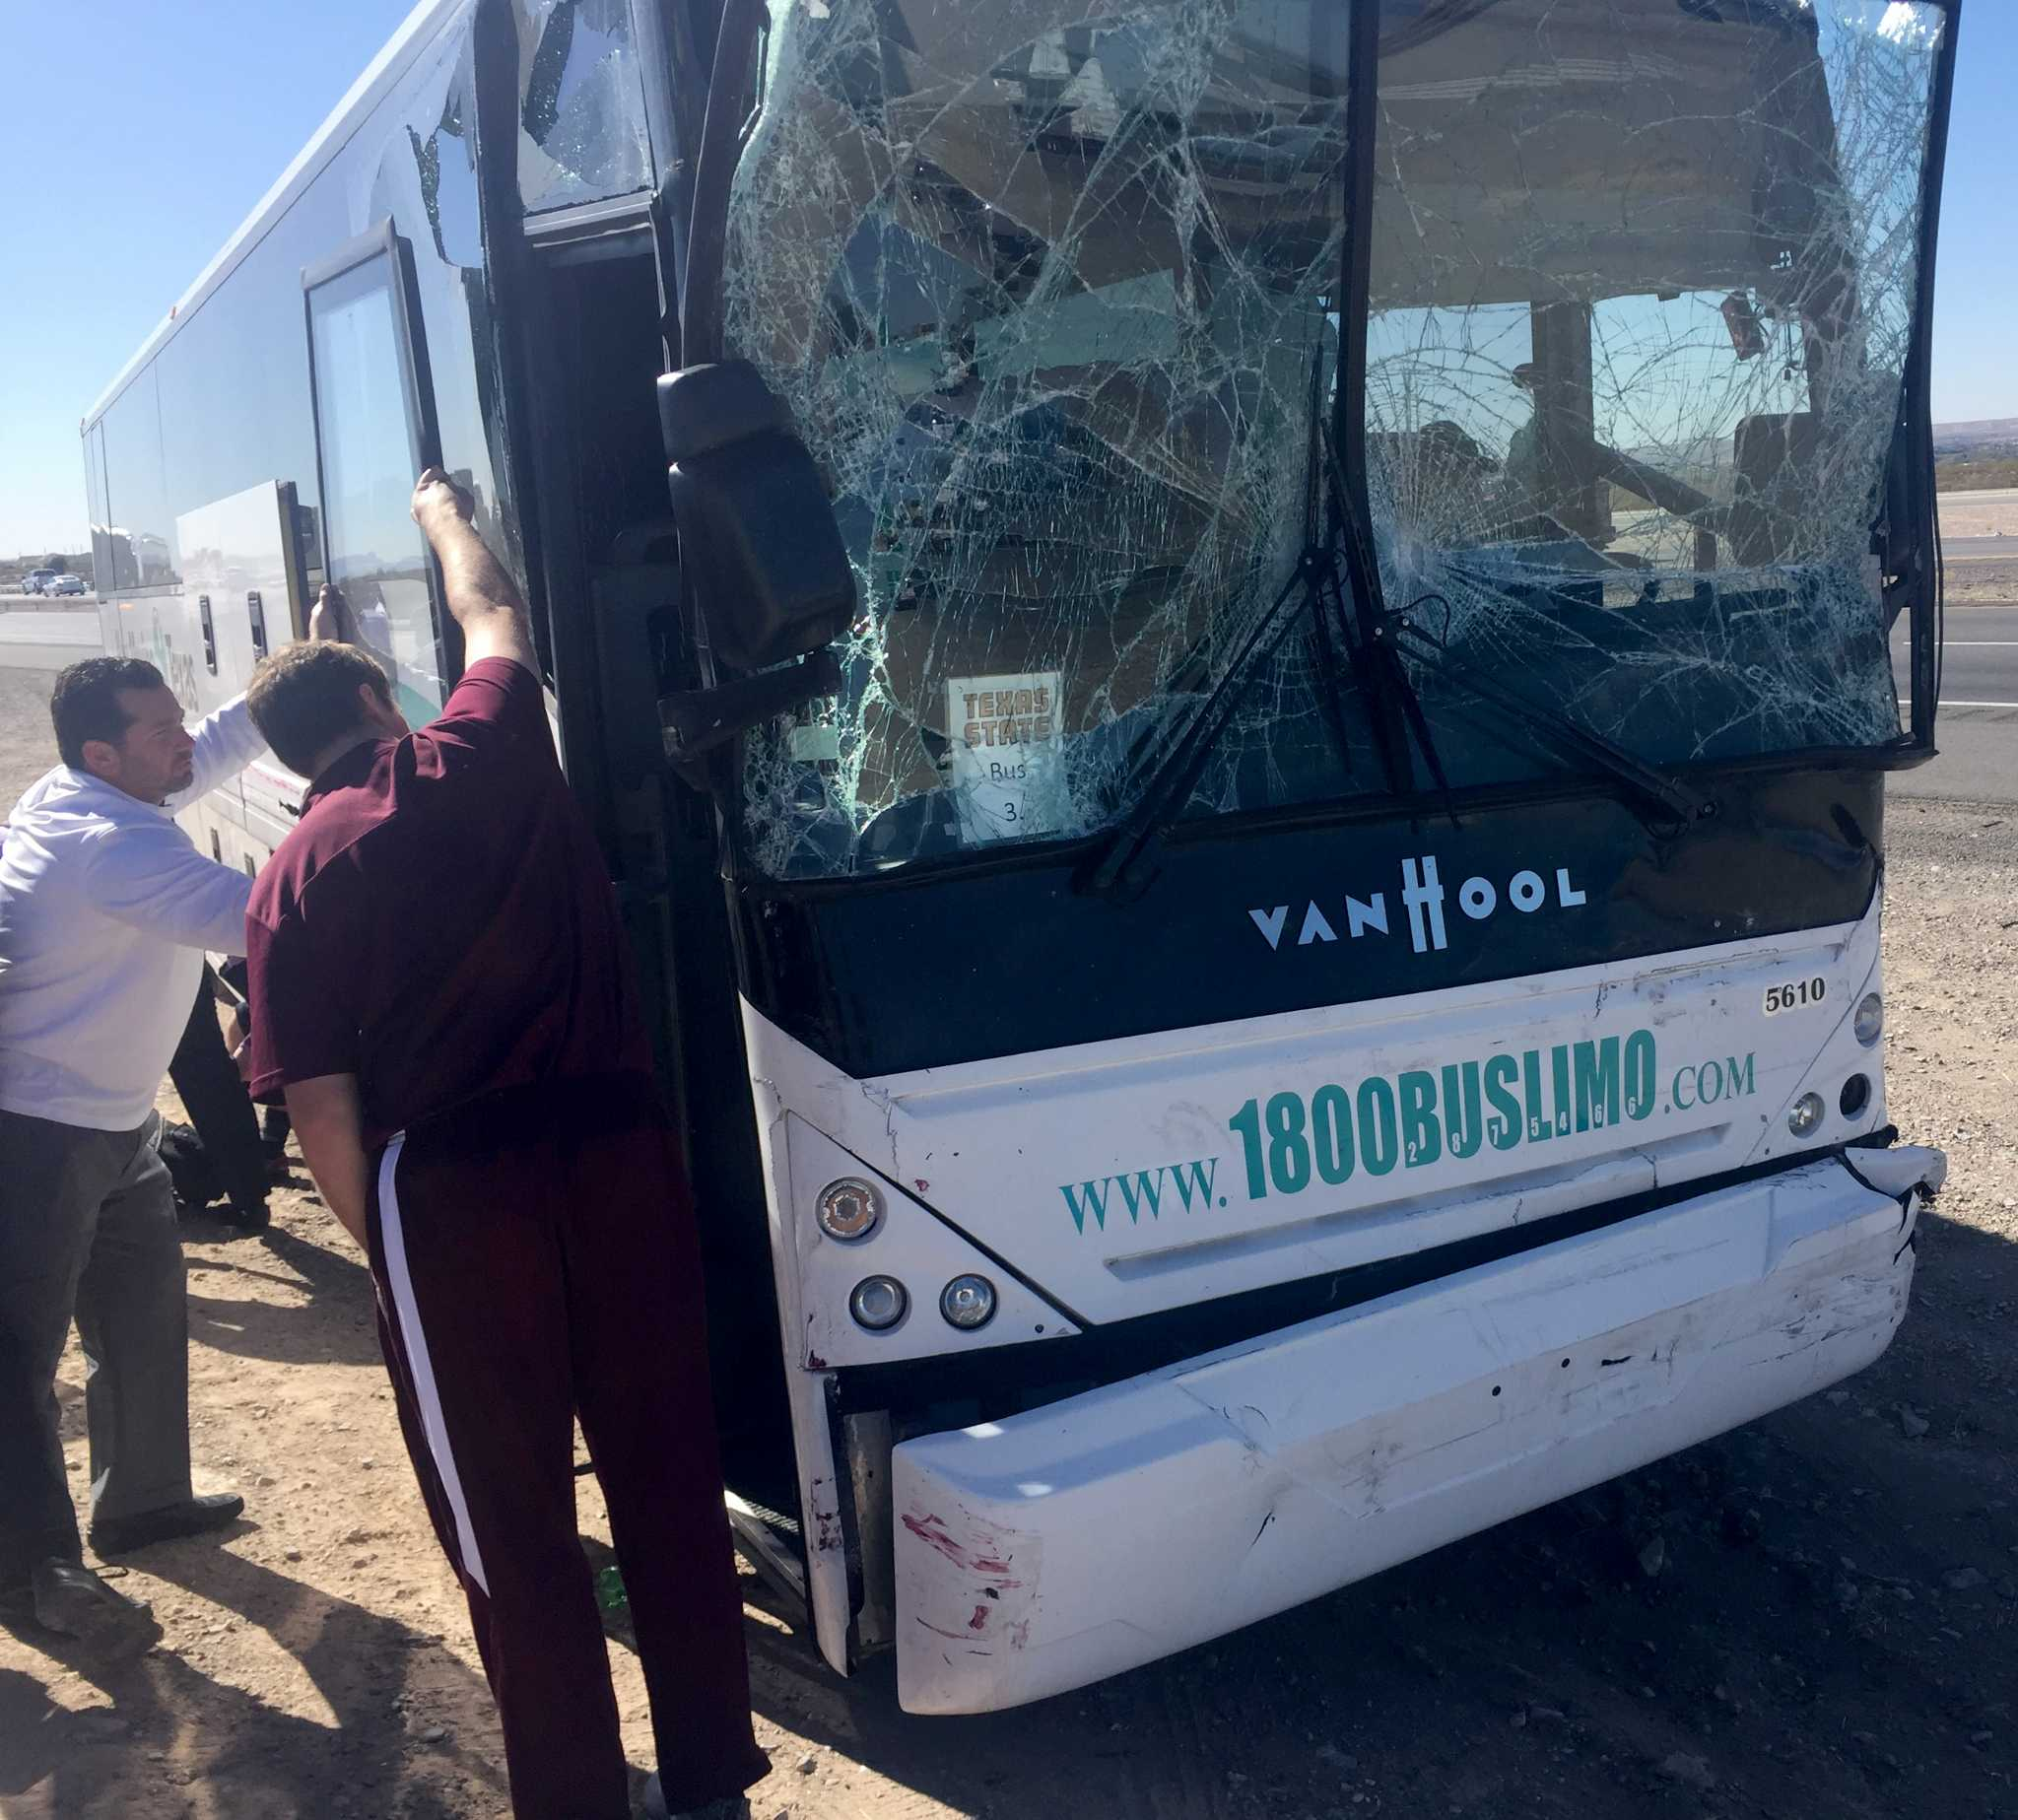 Bus Carrying Texas State Football Team Wrecks Near New